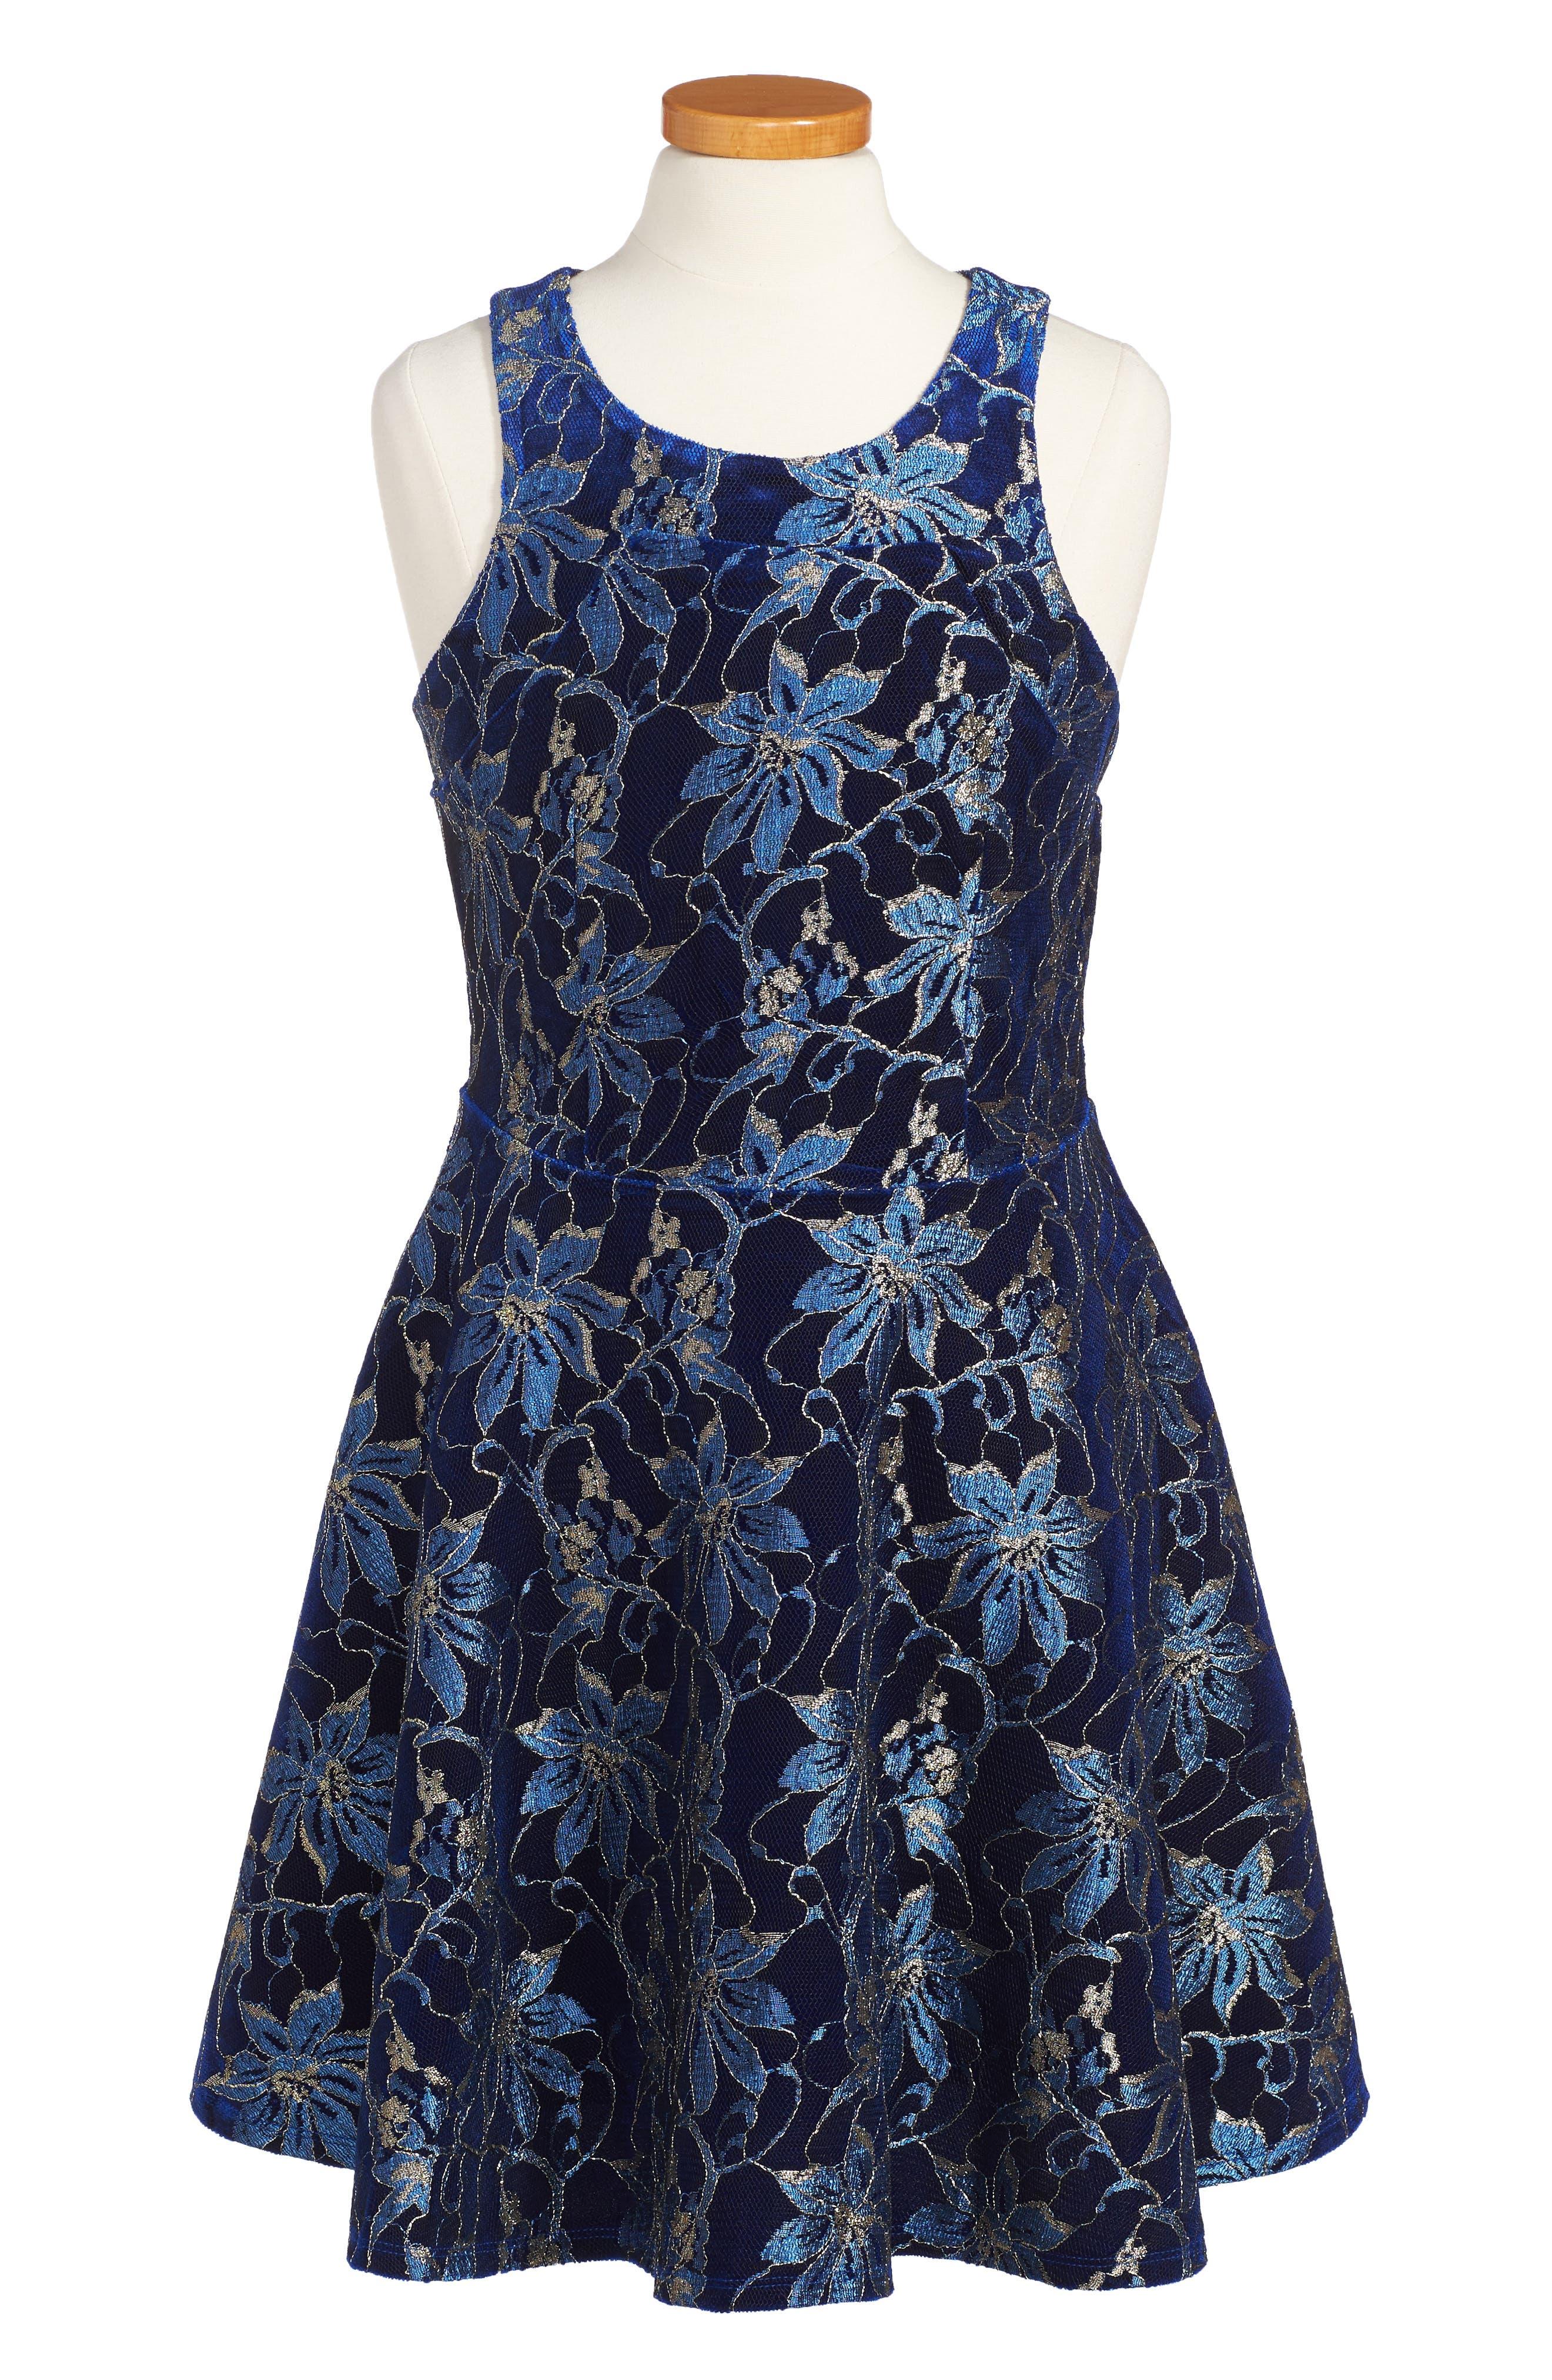 Main Image - Miss Behave Heather Floral Mesh Dress (Big Girls)